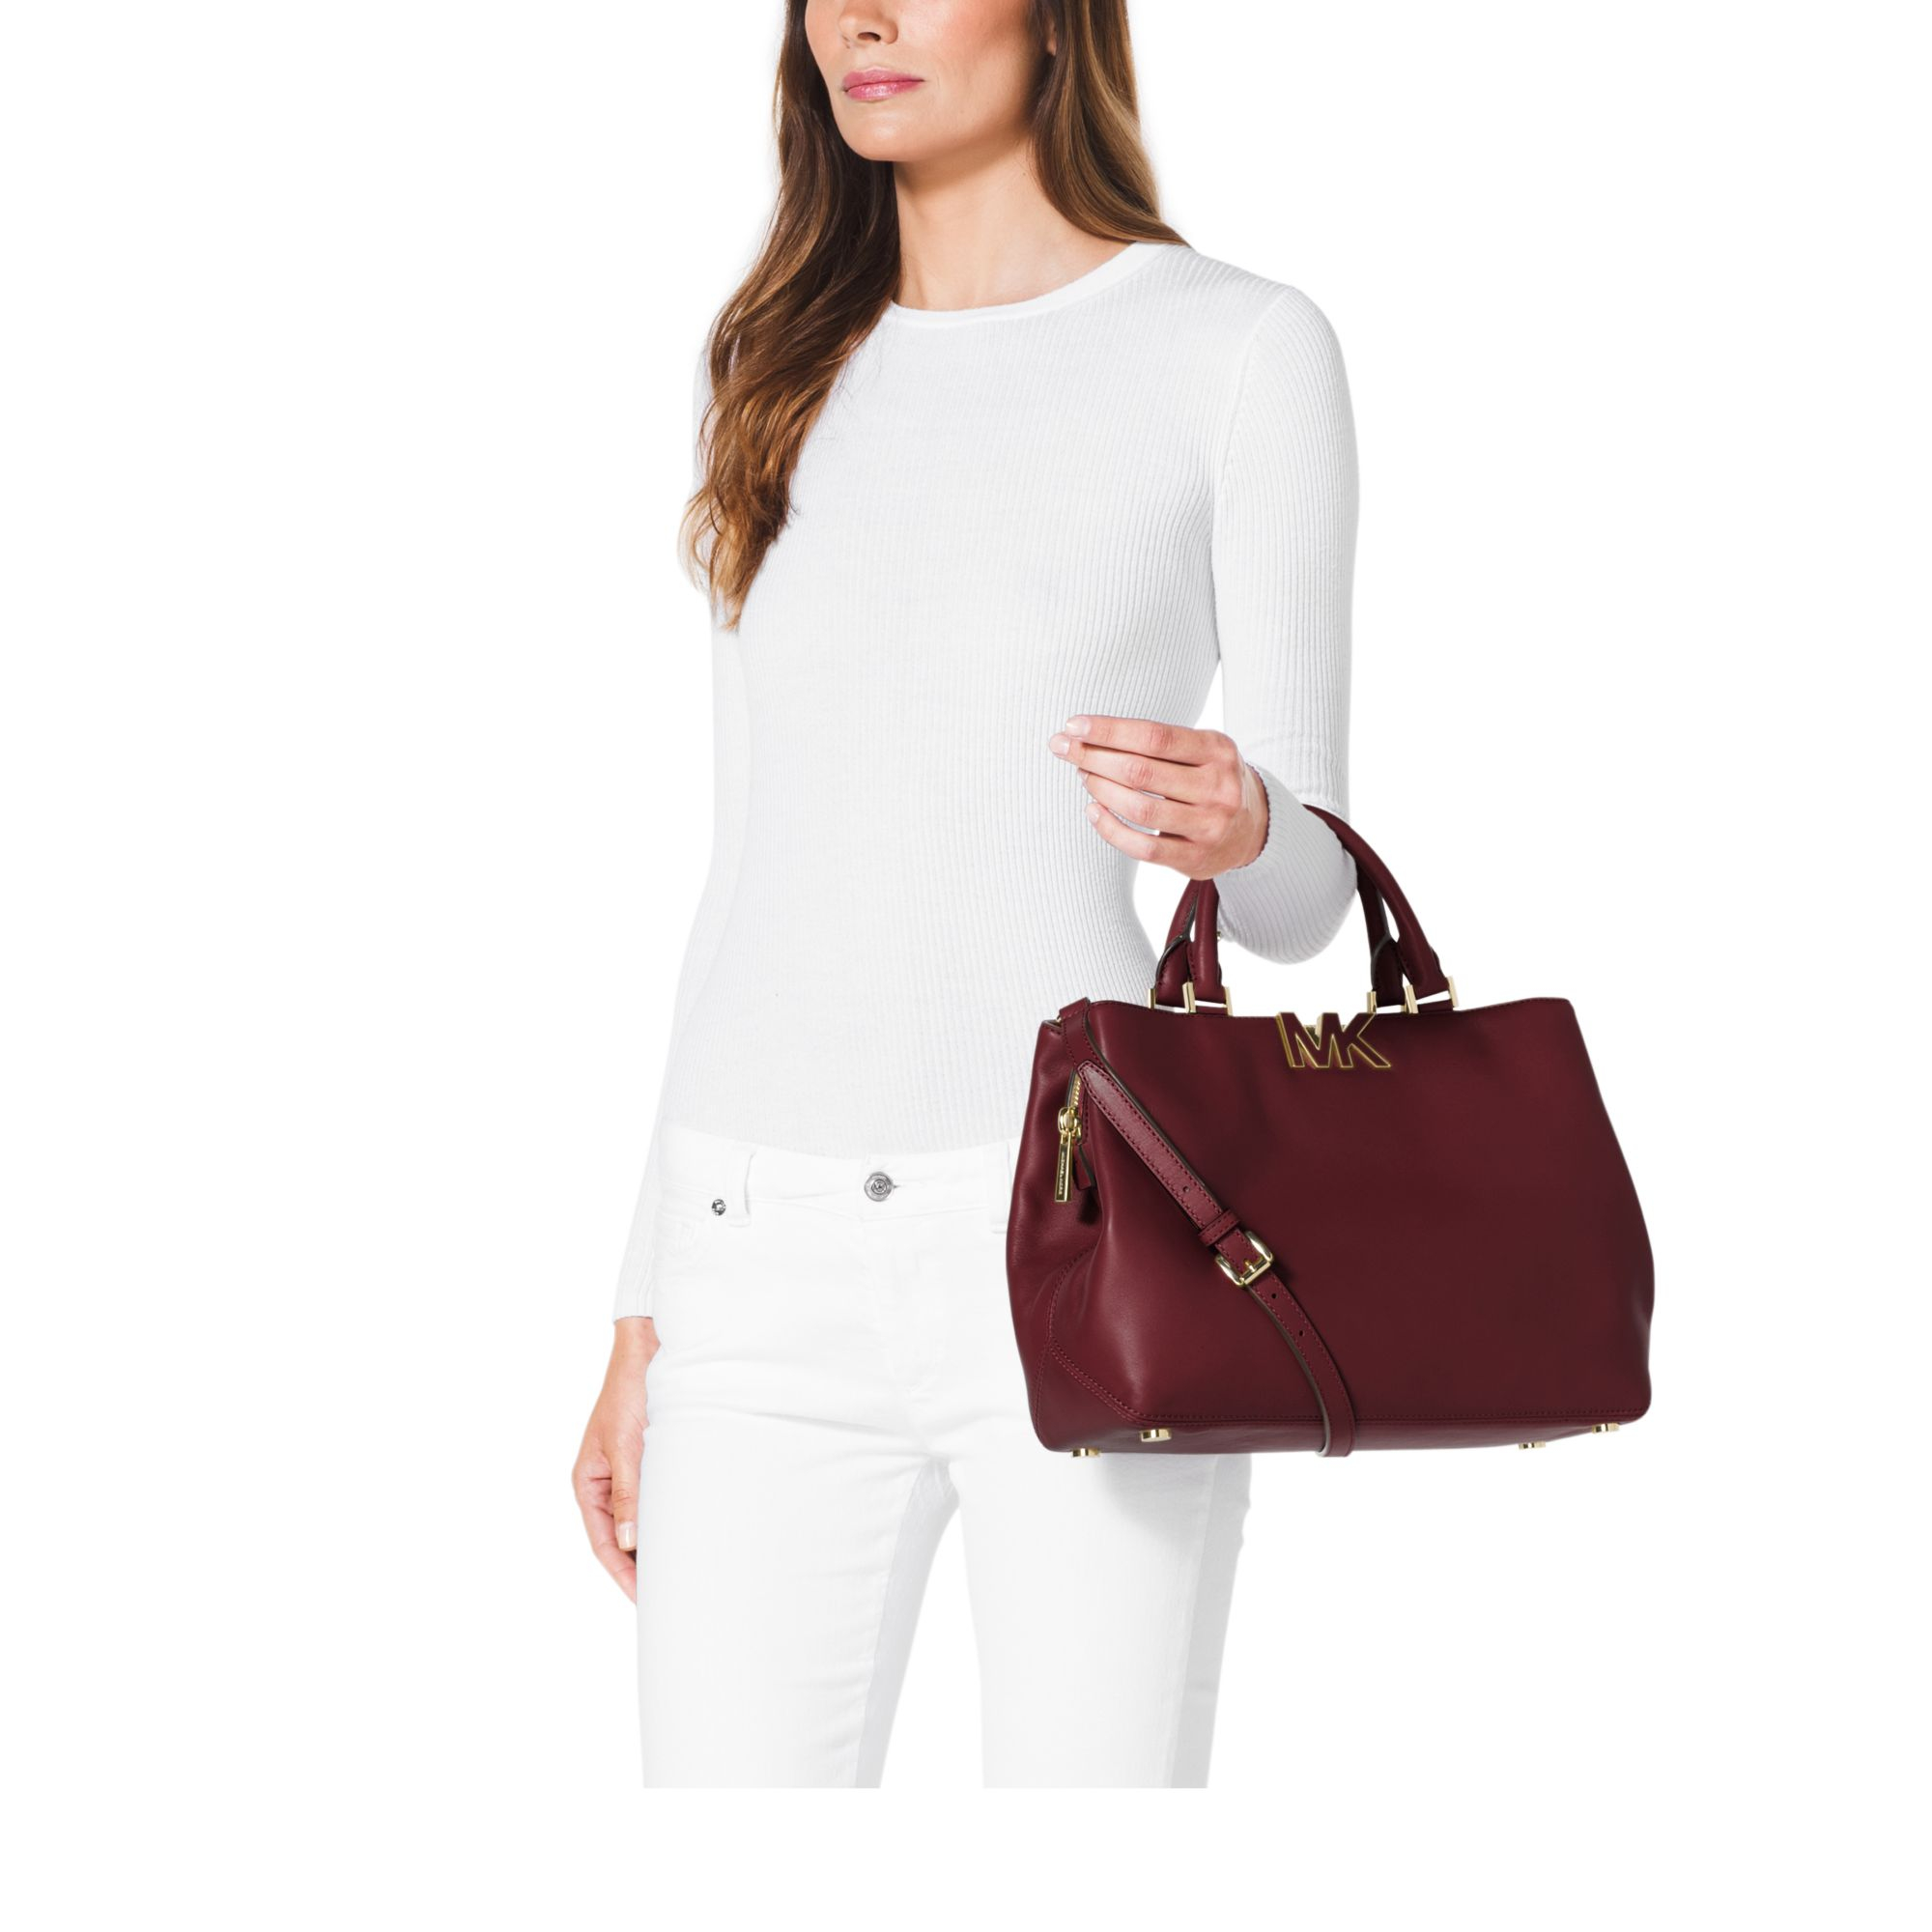 eec0248c13f ... Michael kors Florence Leather Large Satchel in Purple Lyst Michael Kors  Bags ...